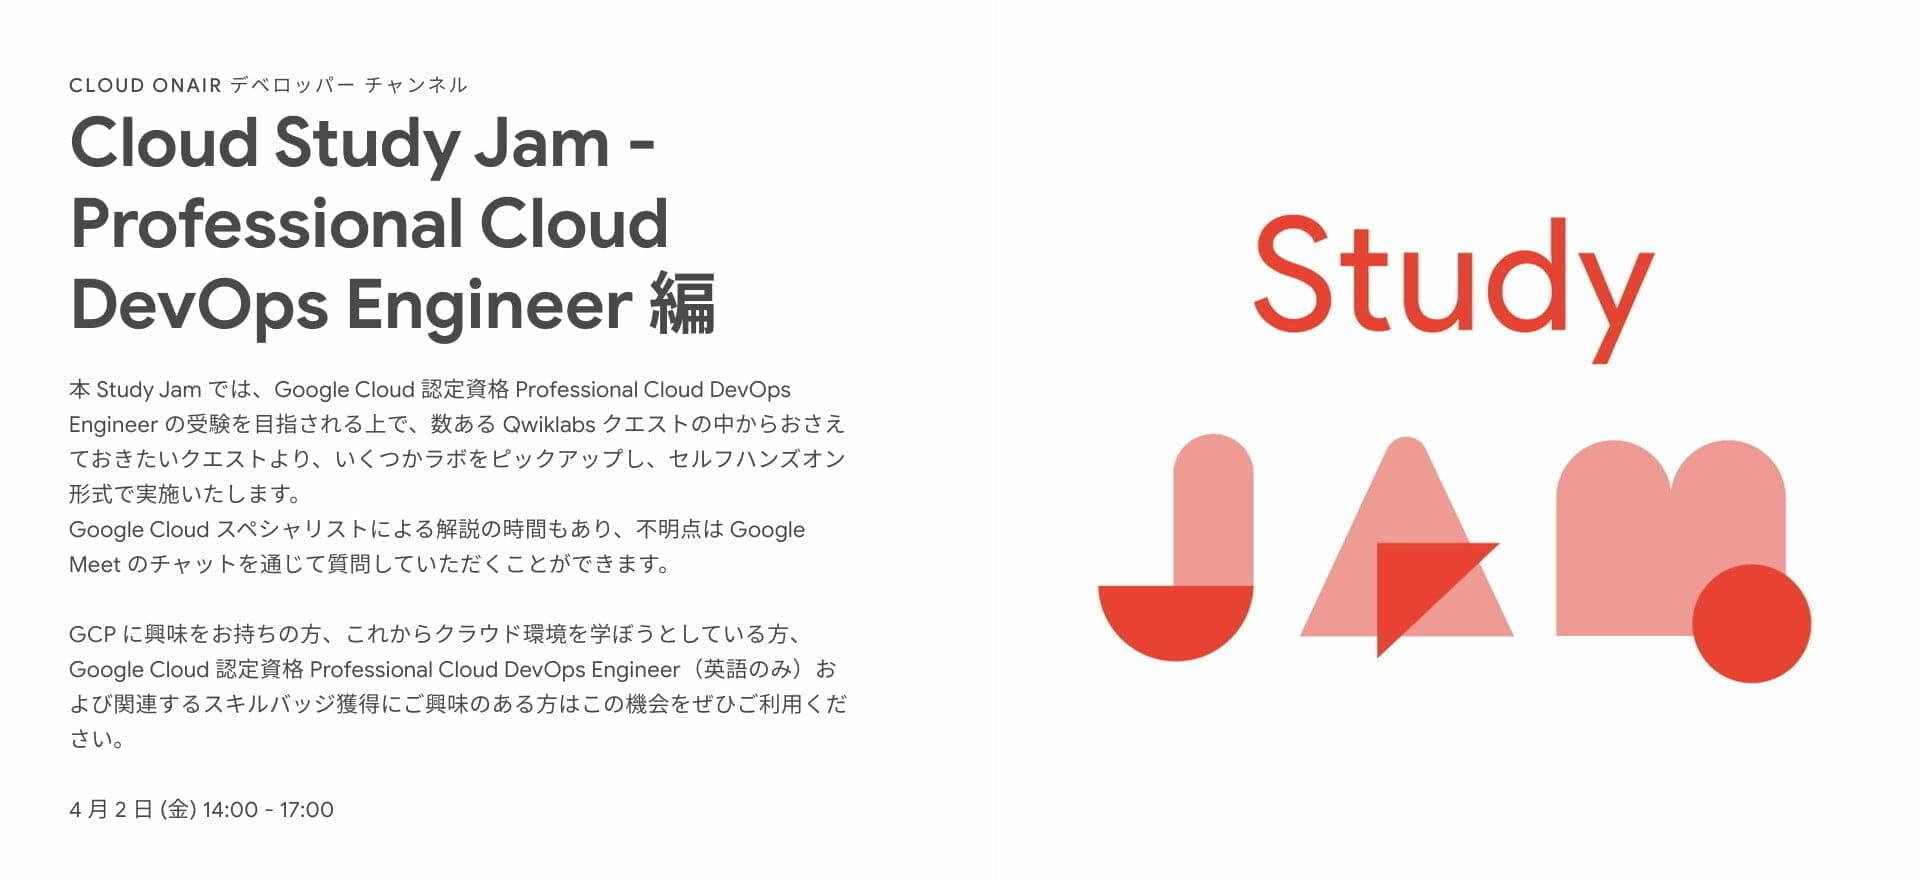 [GCP] Cloud Study Jam - Professional Cloud DevOps Engineer 編